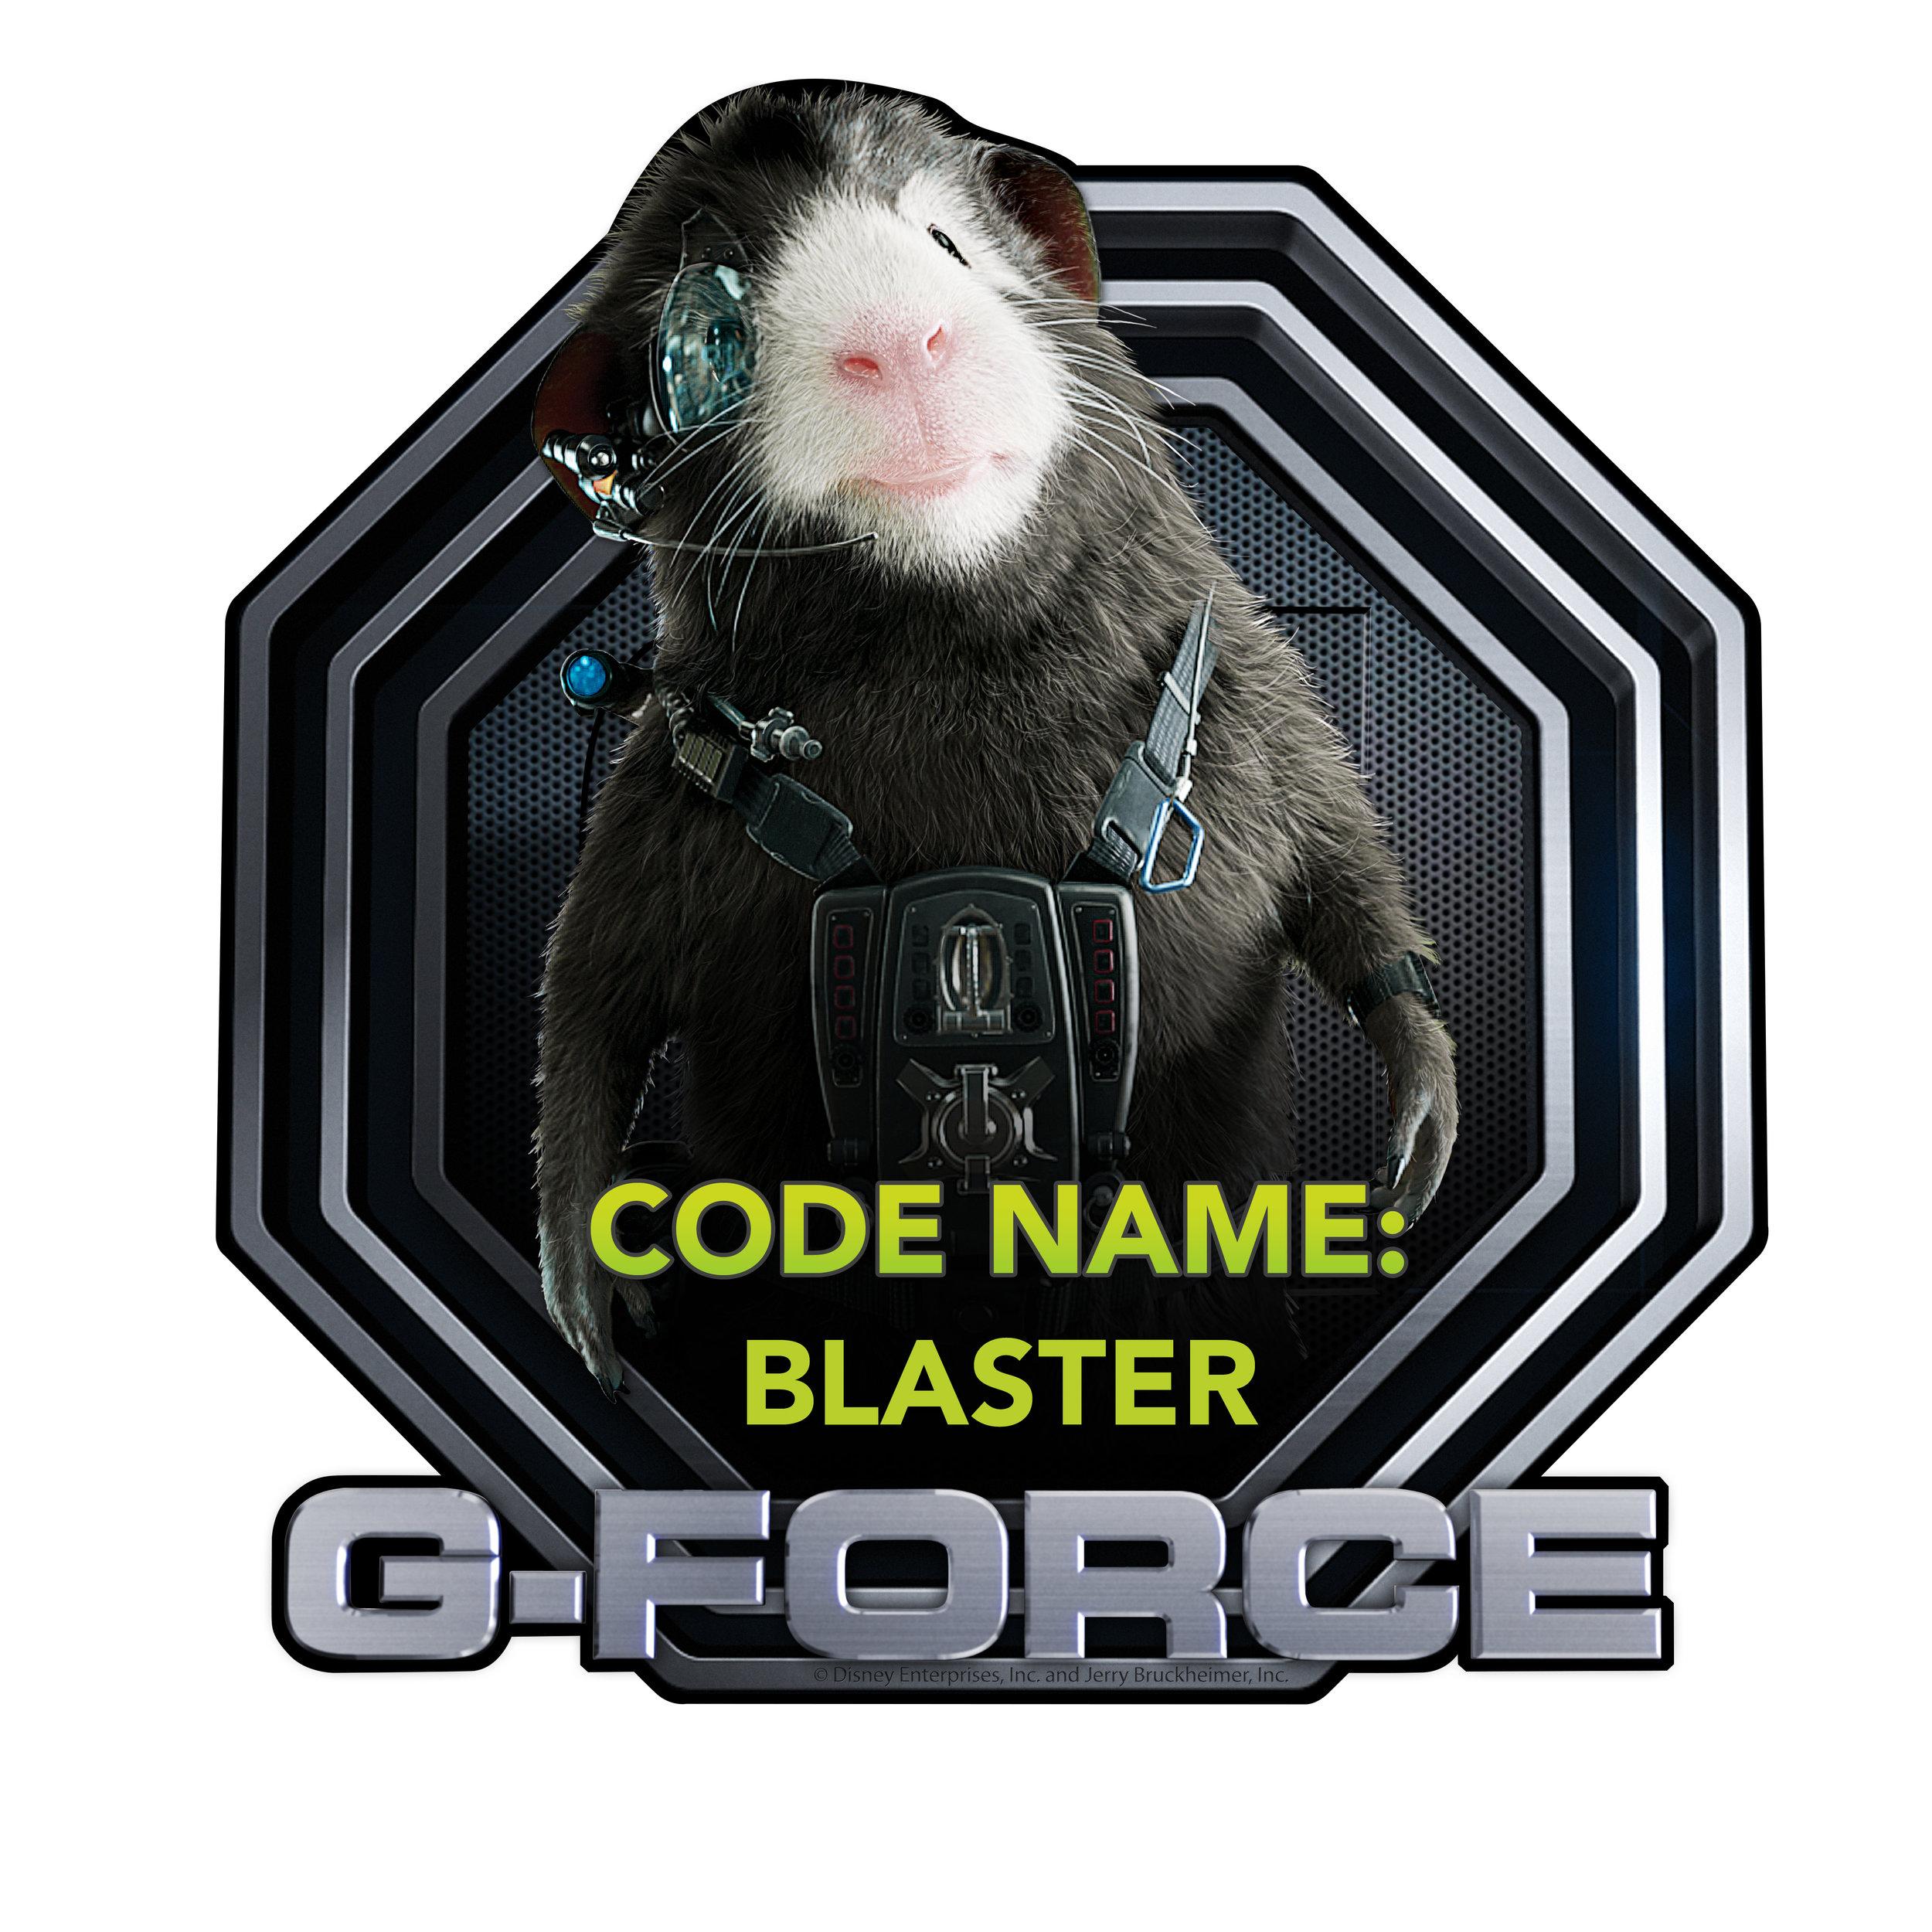 Gforce_Blaster.jpg